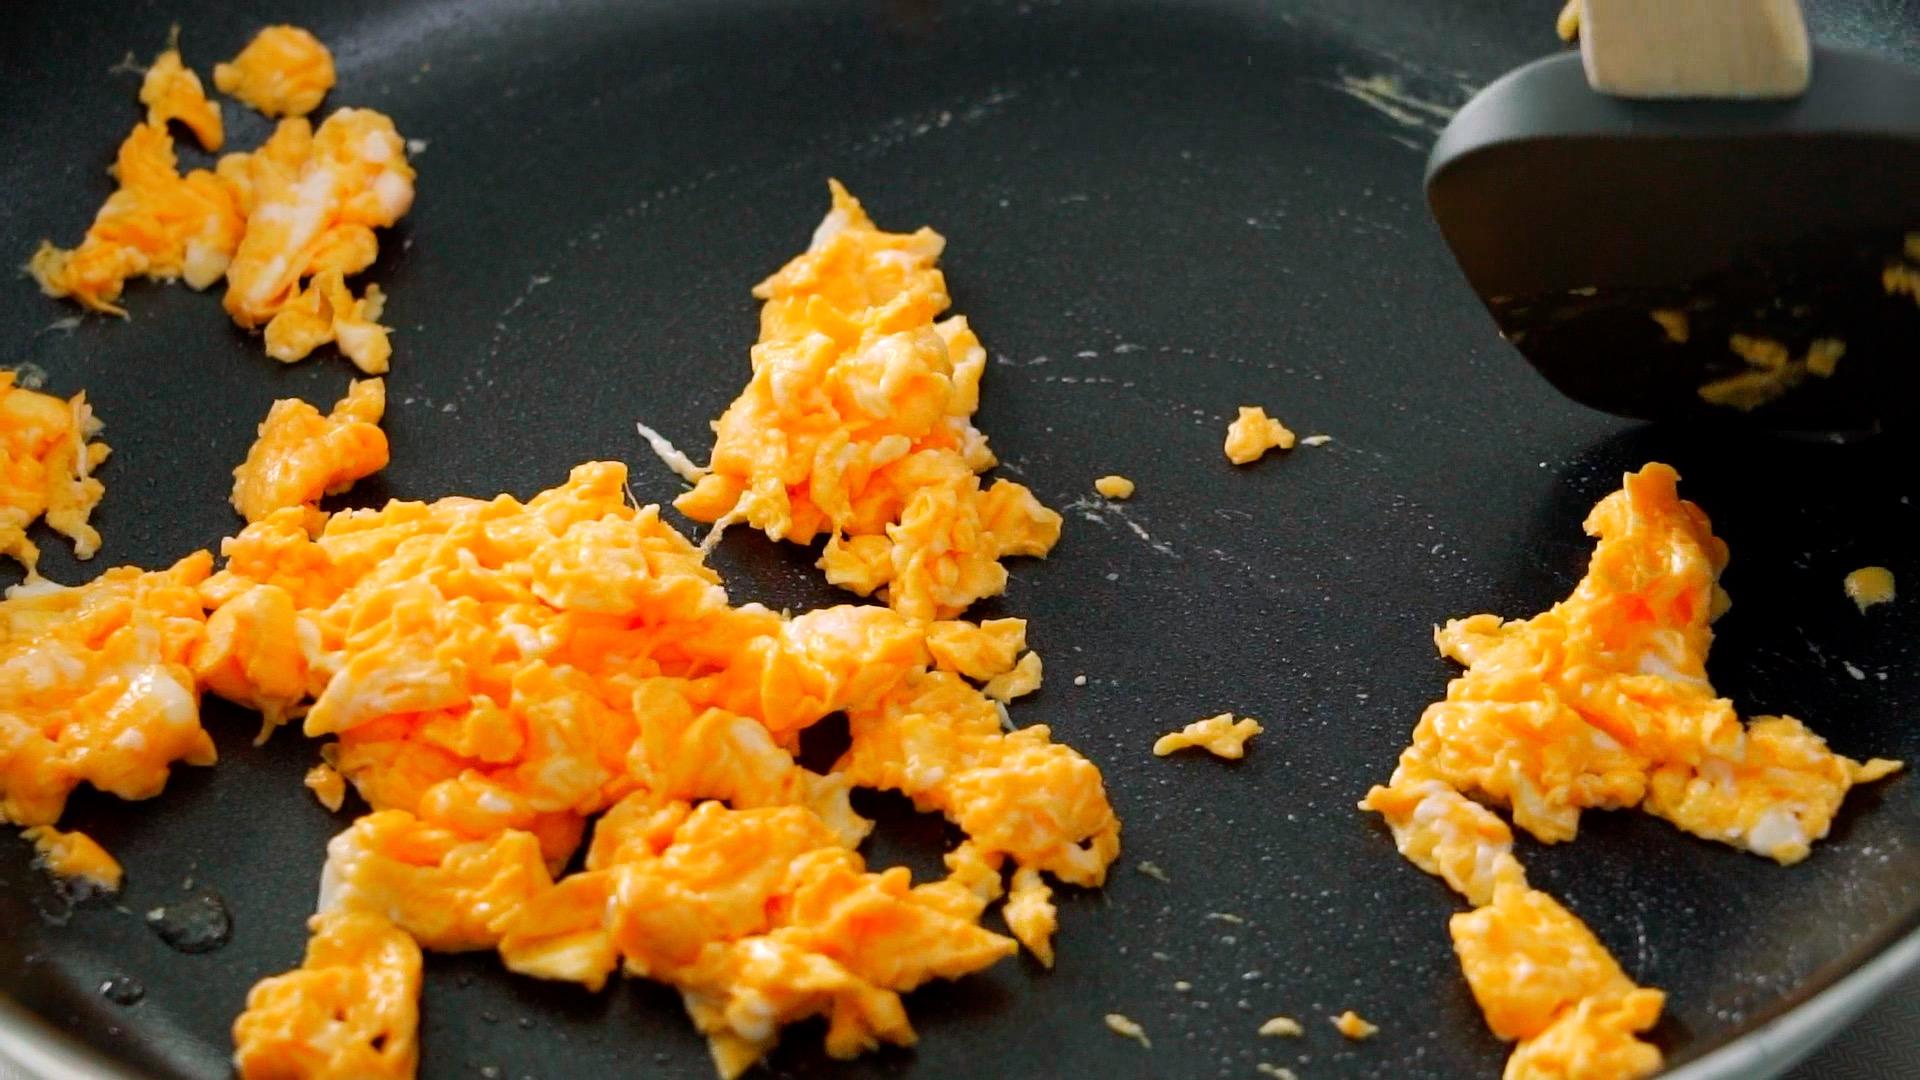 Scrambling eggs for Singapore Noodles.